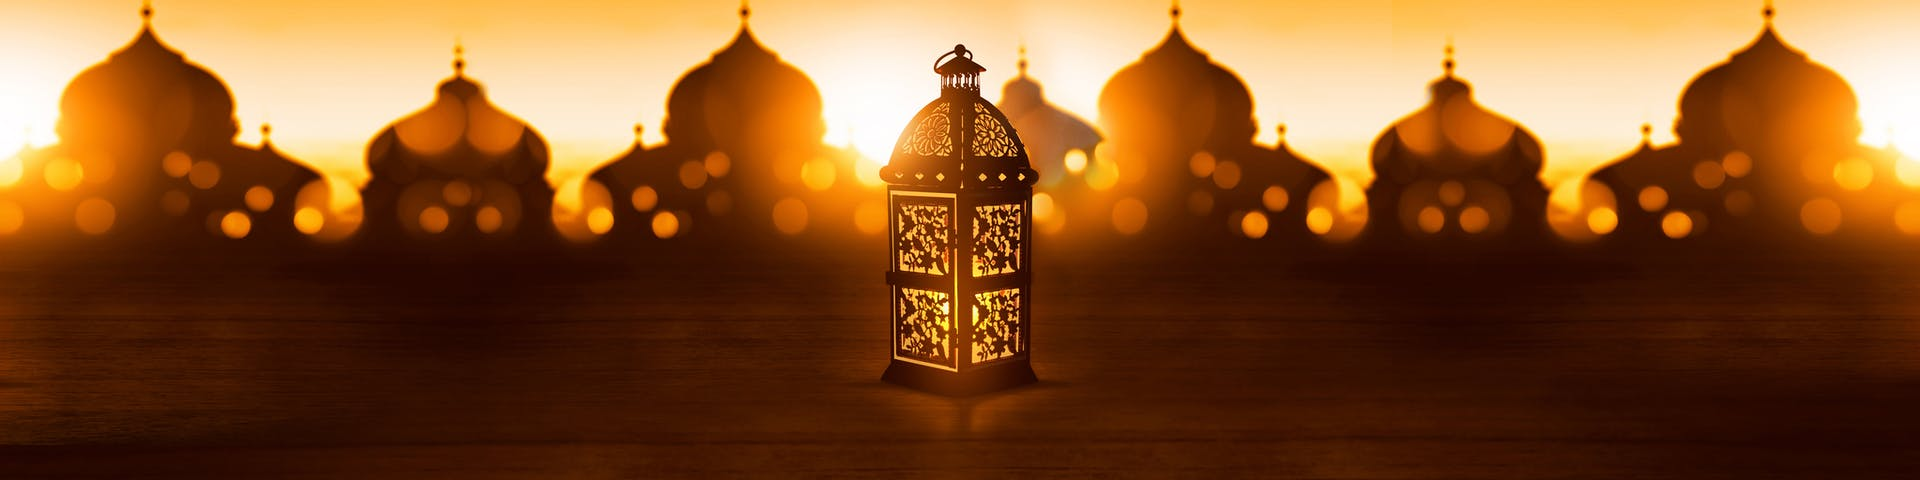 Eid al fitr lantern glowing at night